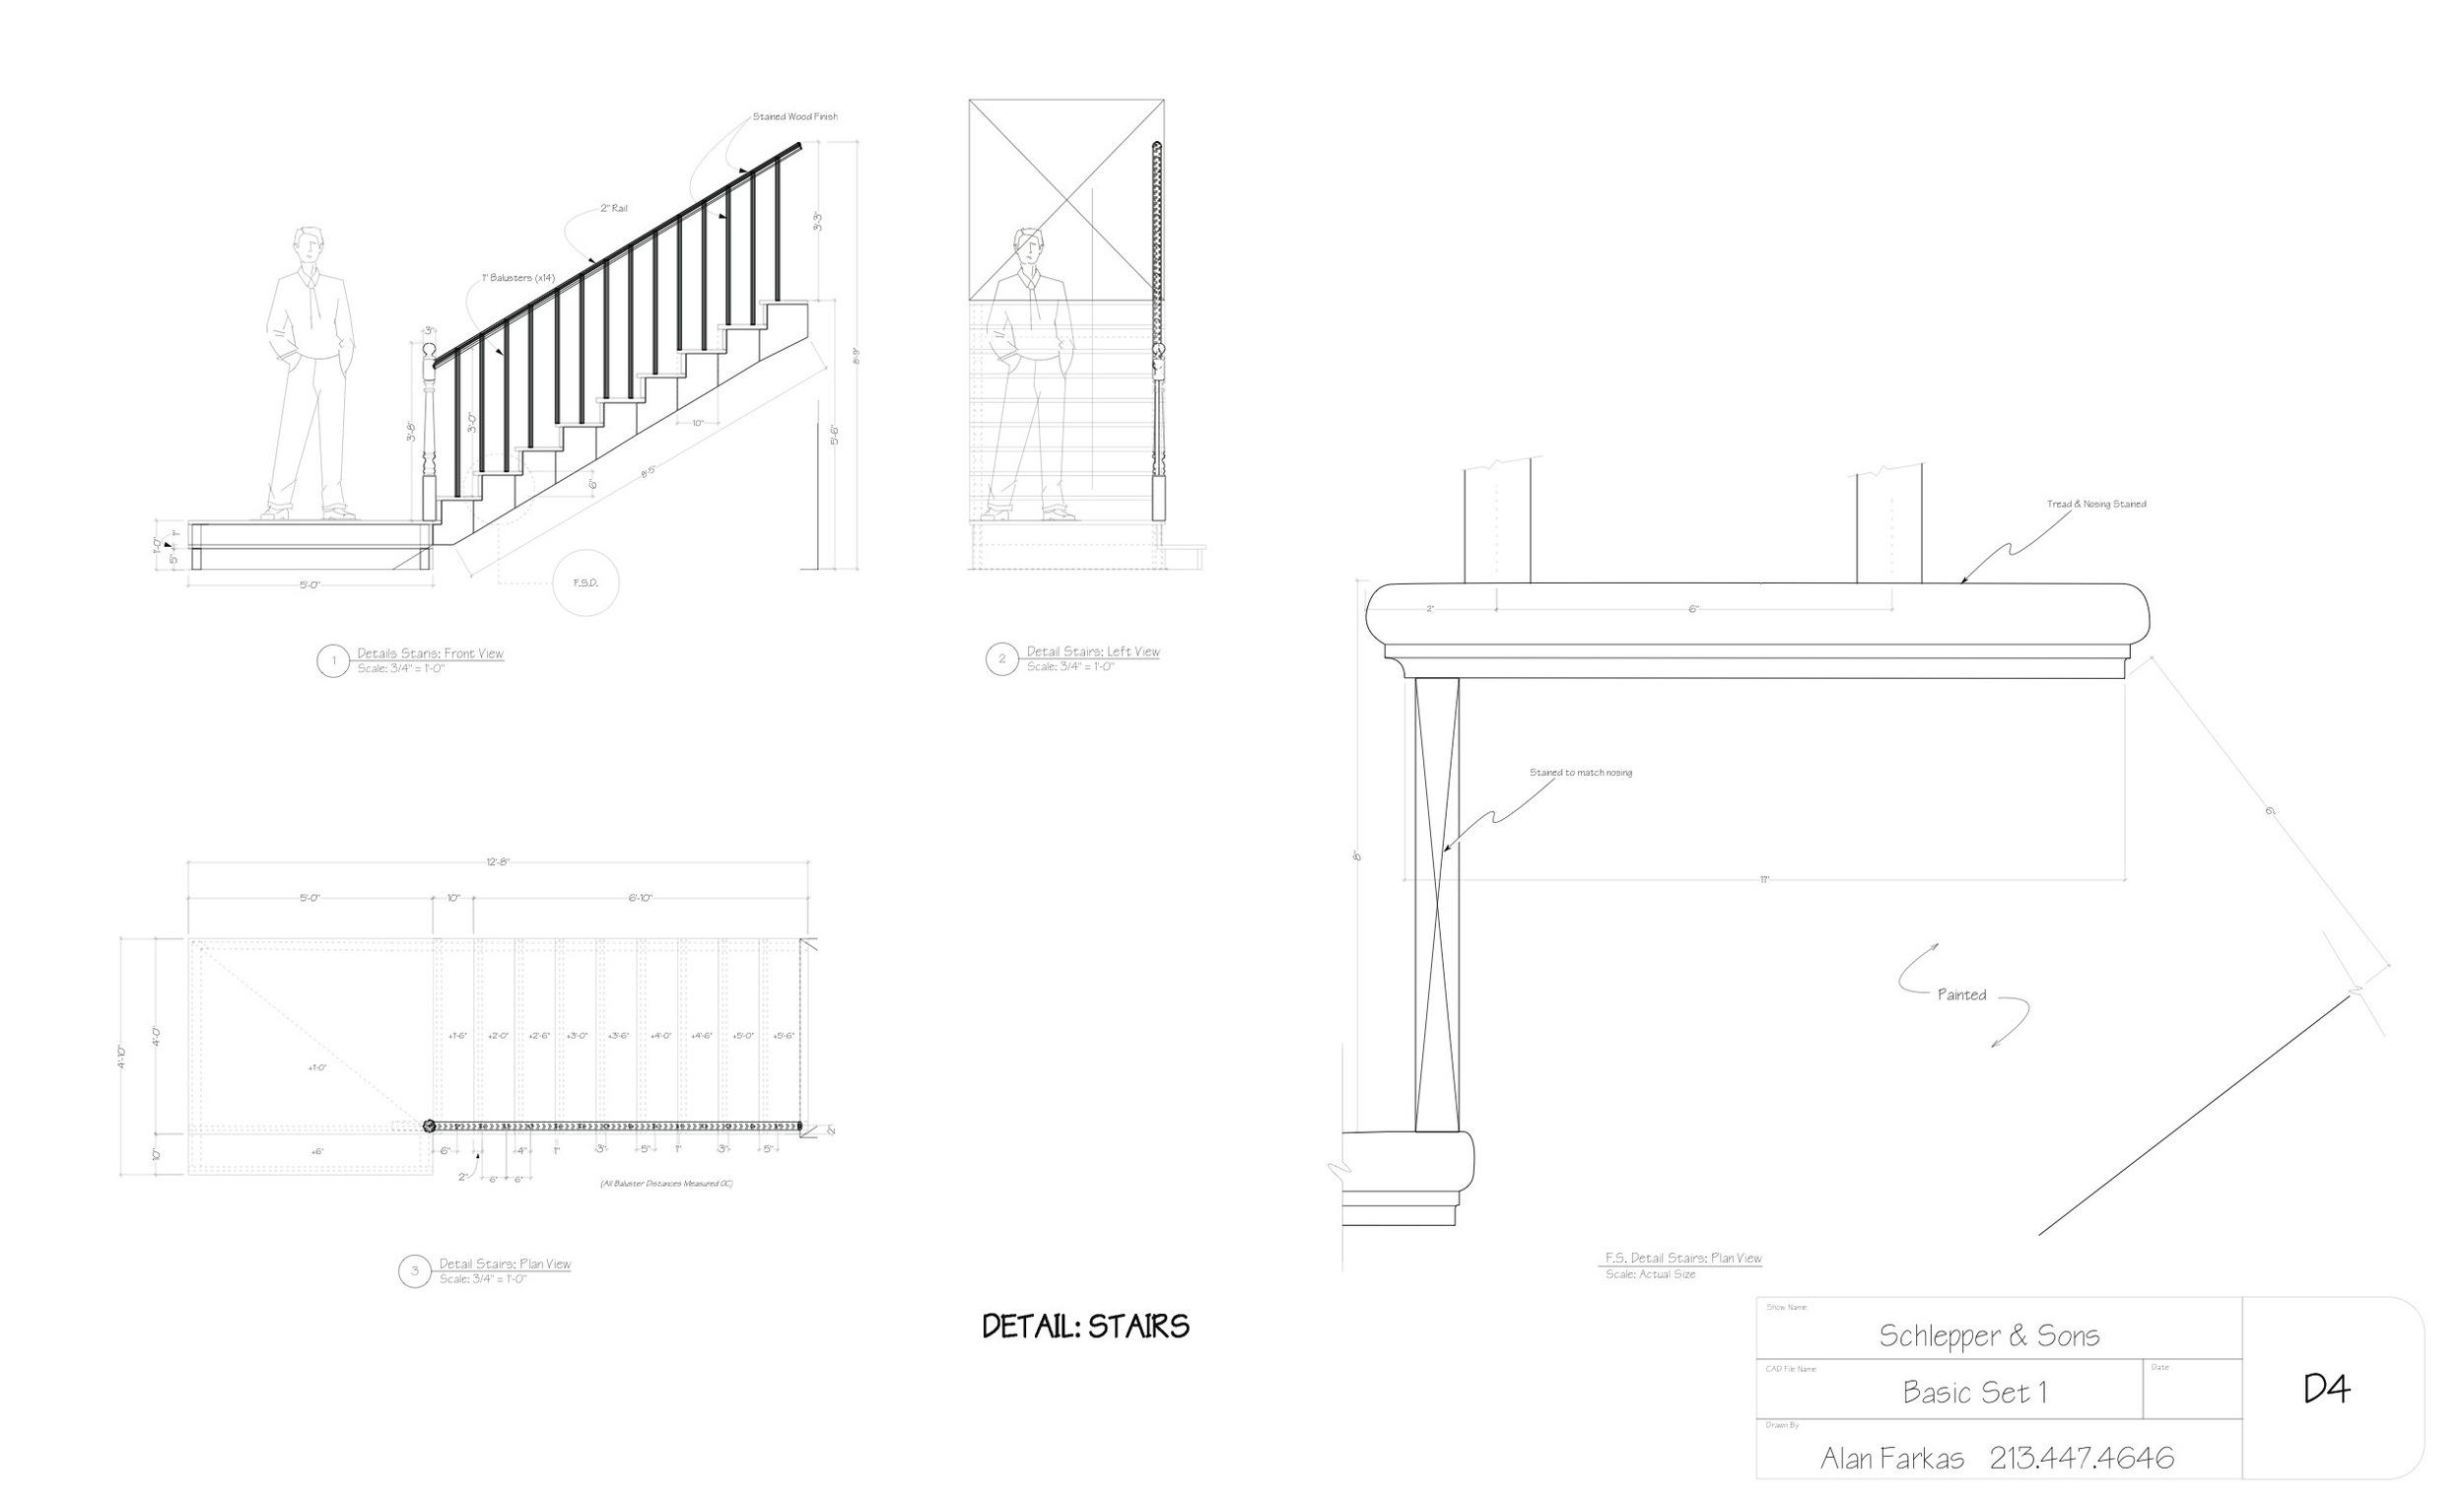 Alan Farkas_3D Set Design + Illustration_Reduced 38.jpeg